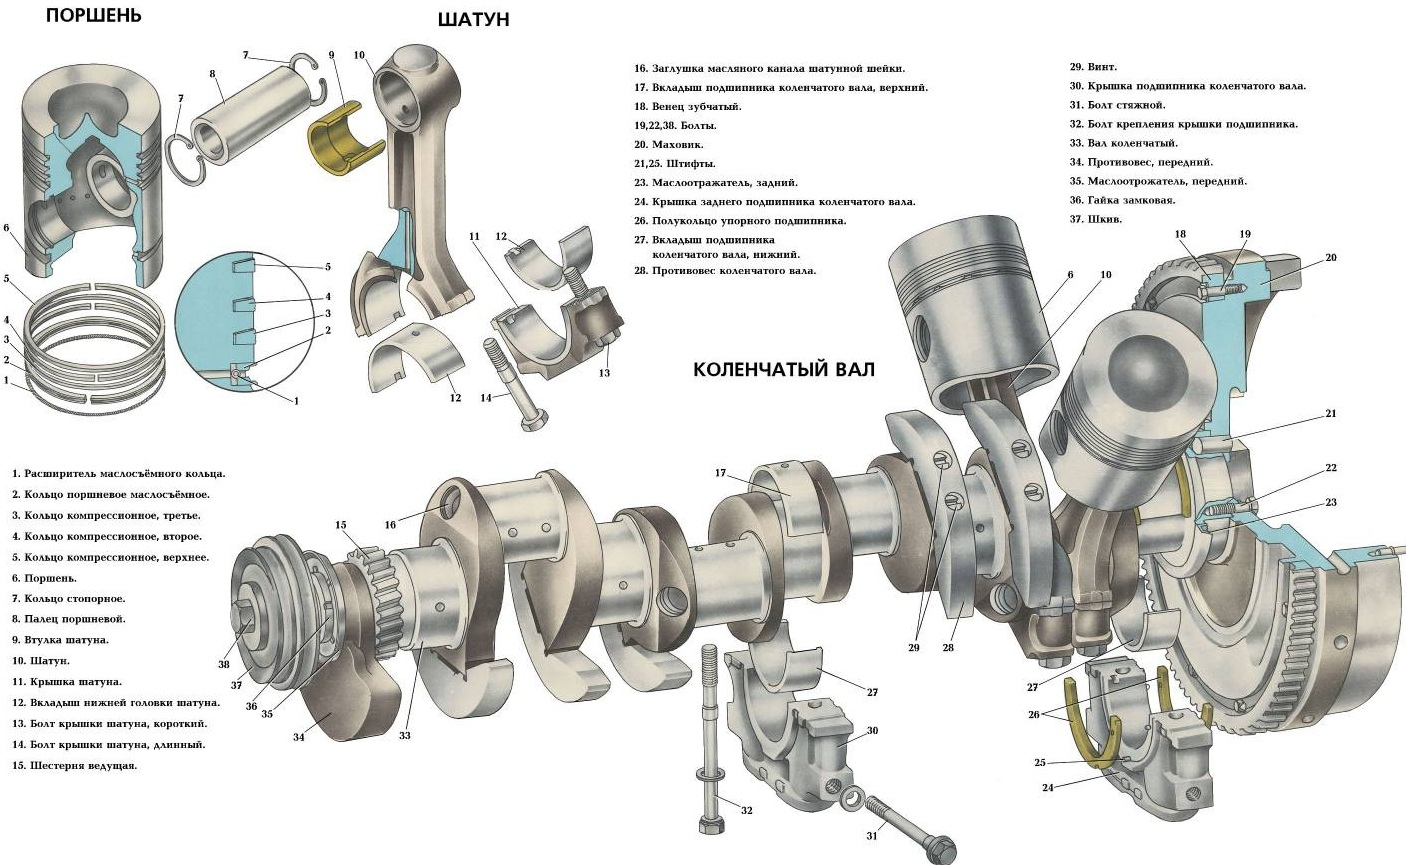 Ремонт кривошипно шатунного механизма